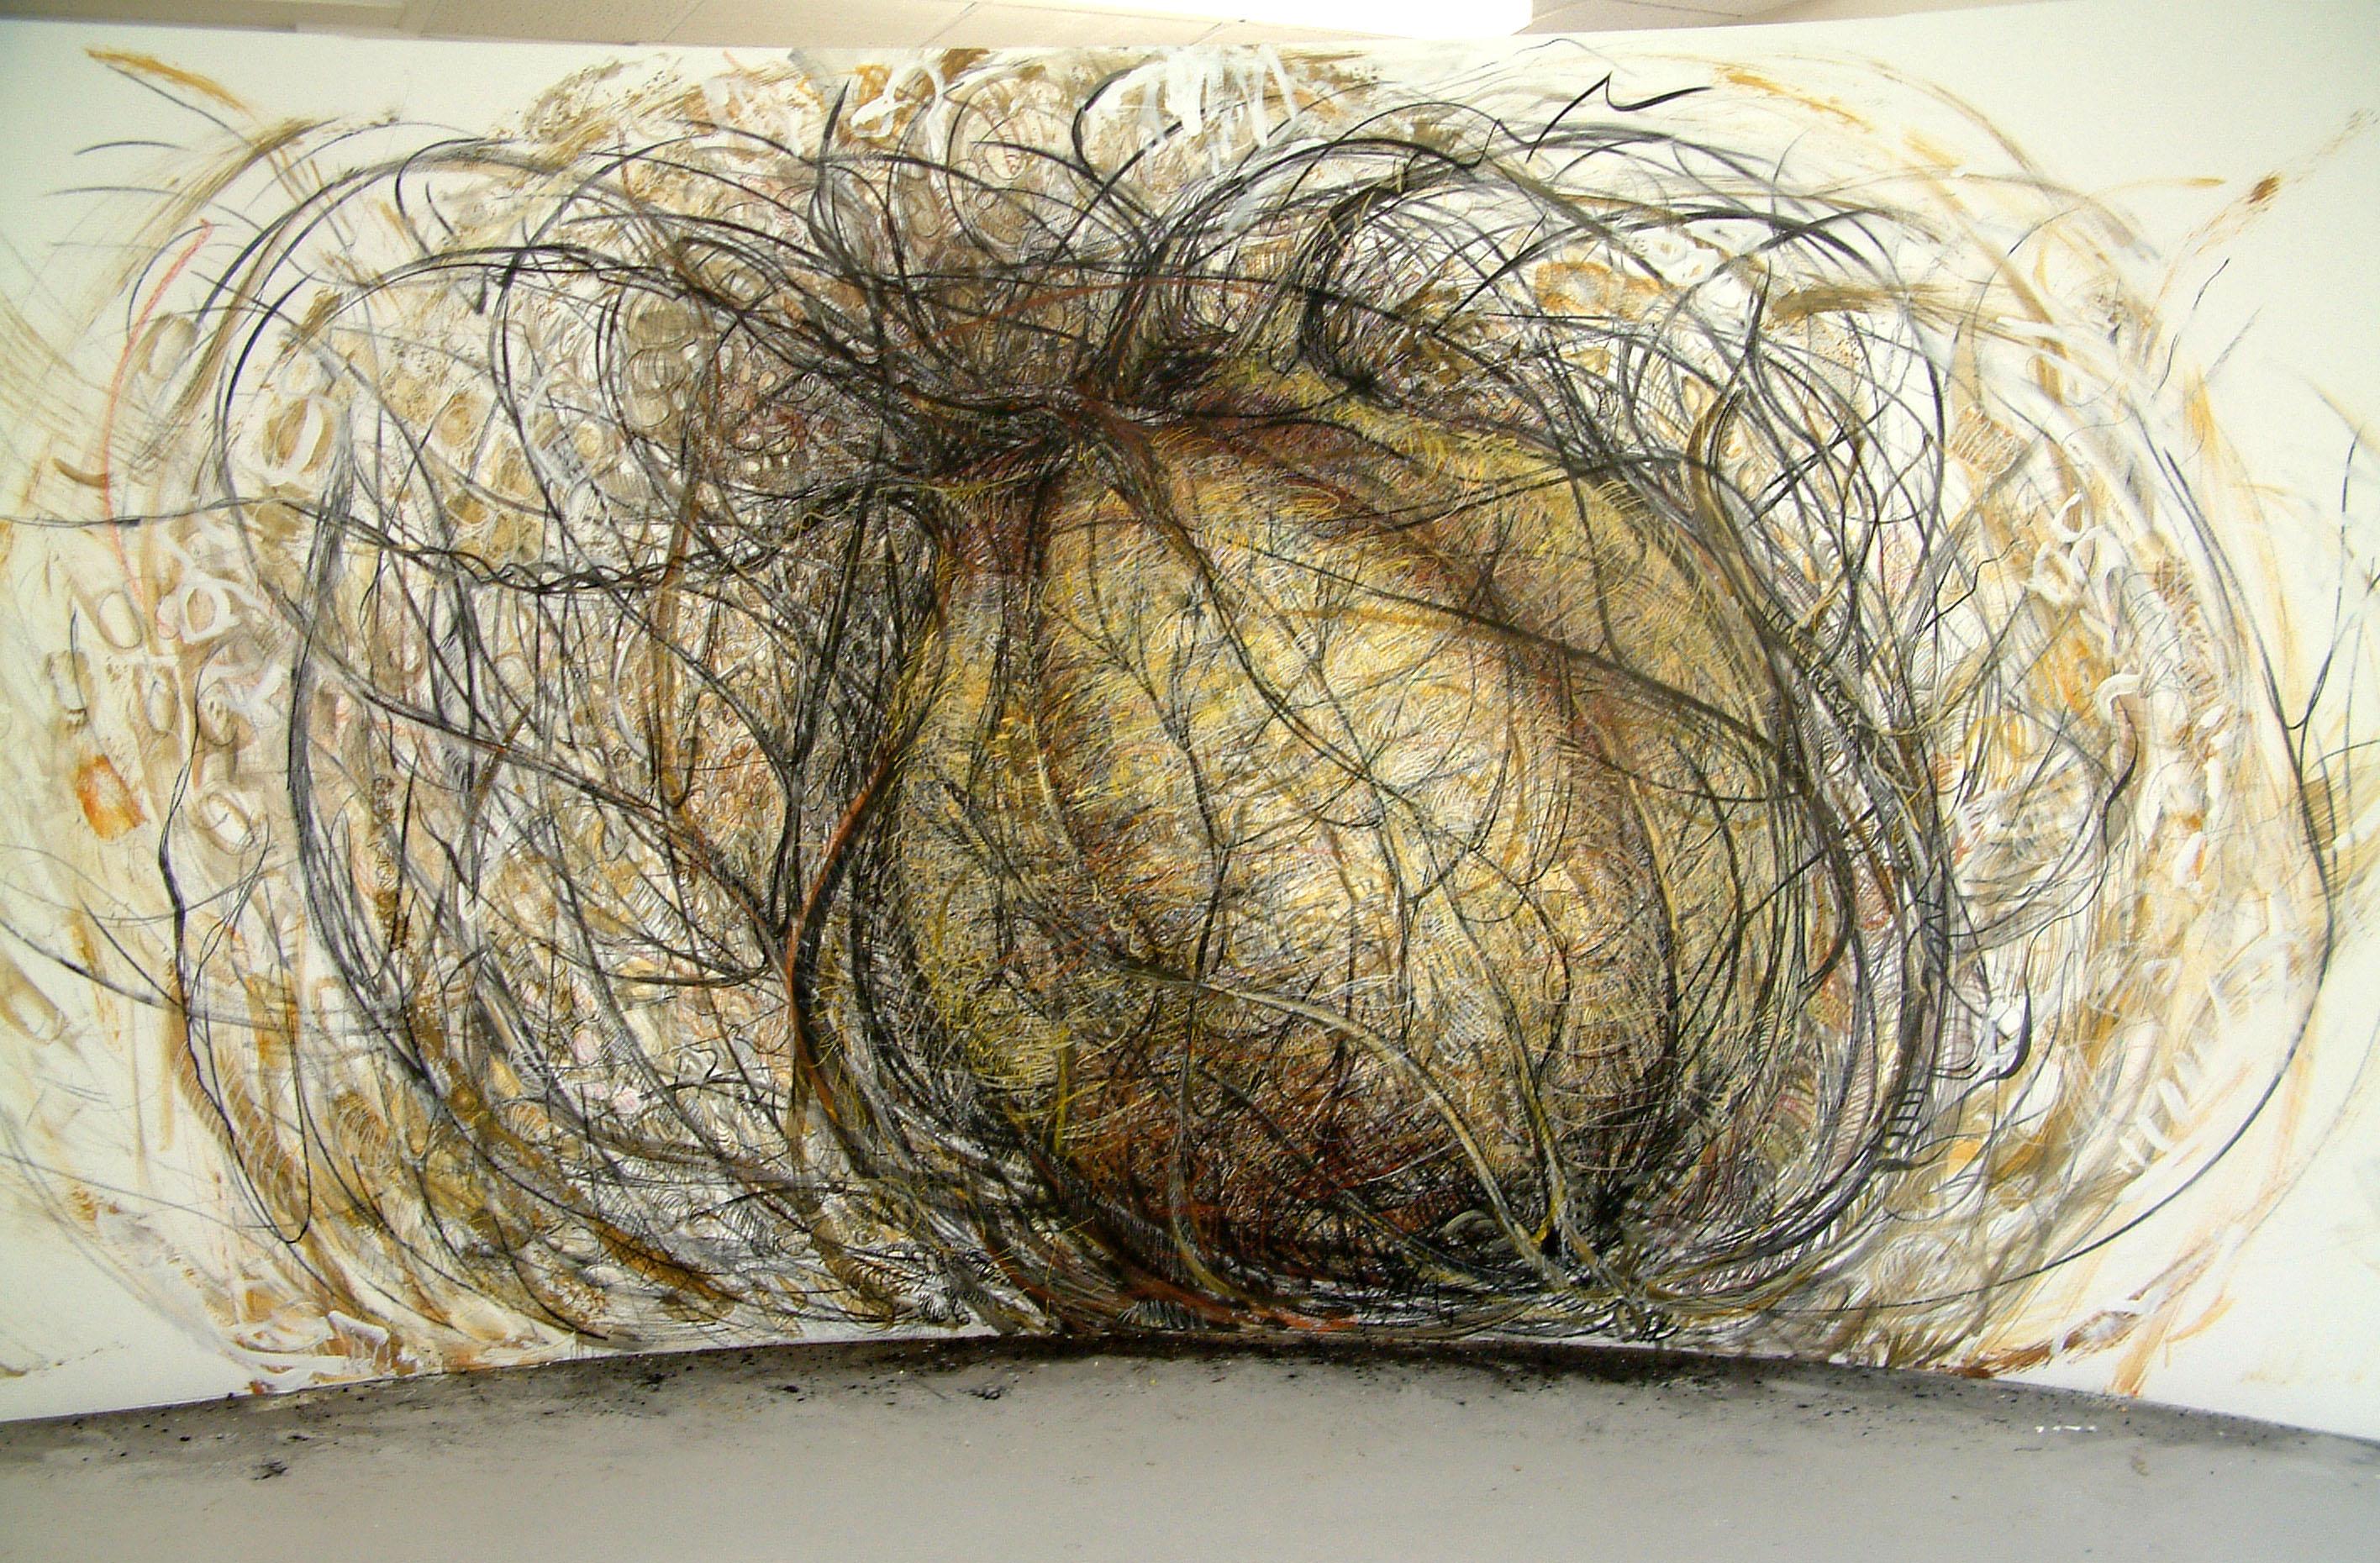 rohini-devasher-copyright-seed-wall-drawing-2004 (1)